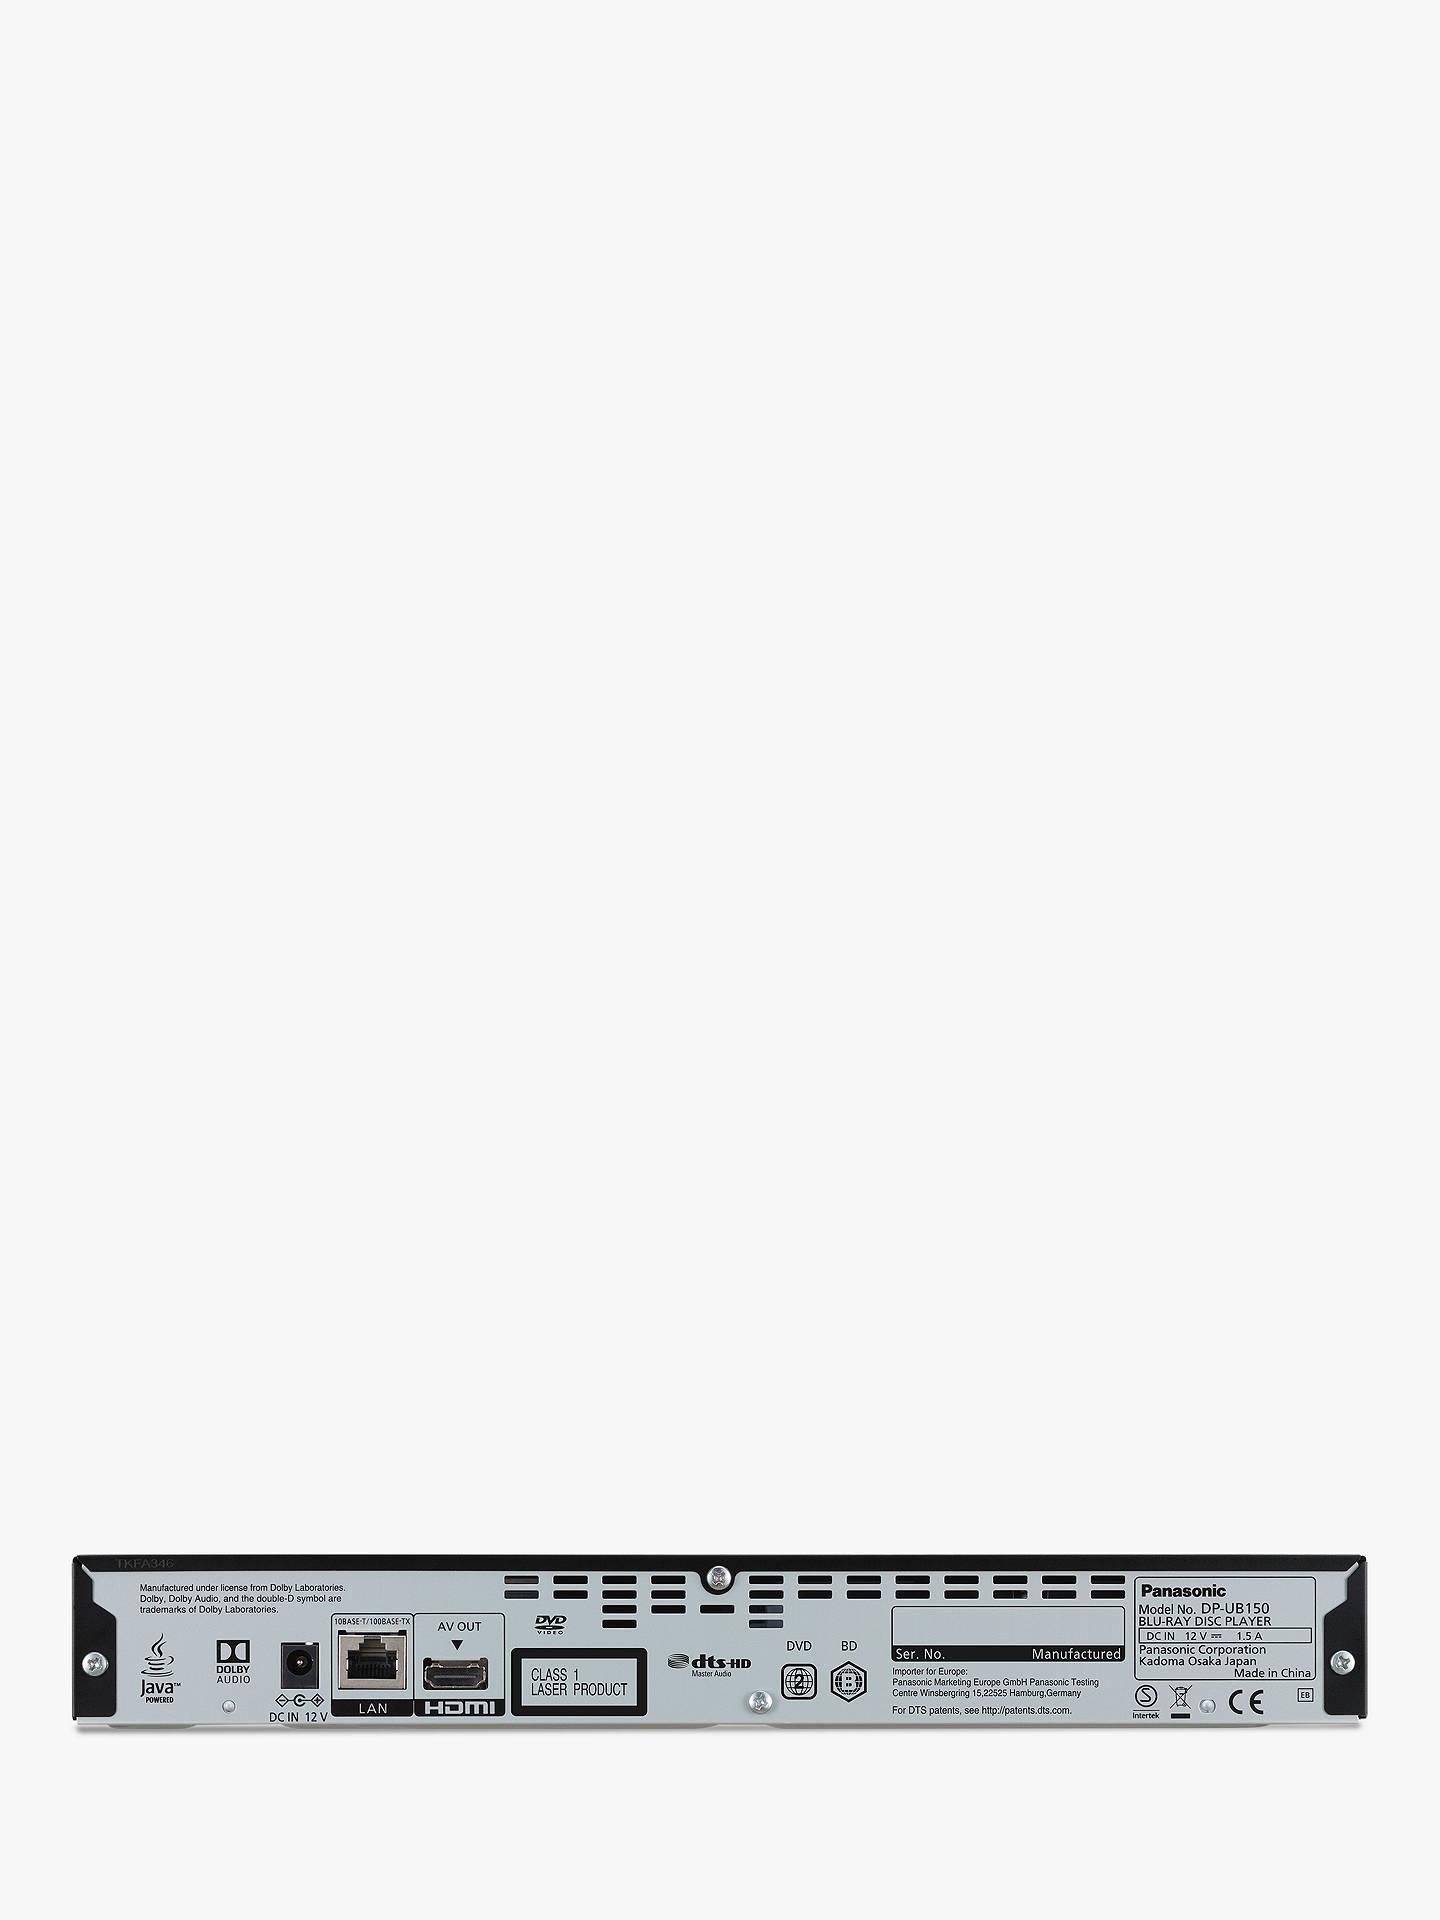 Panasonic DP-UB150EB 3D 4K UHD Blu-Ray/DVD Player with High Resolution  Audio, Ultra HD Premium Certified